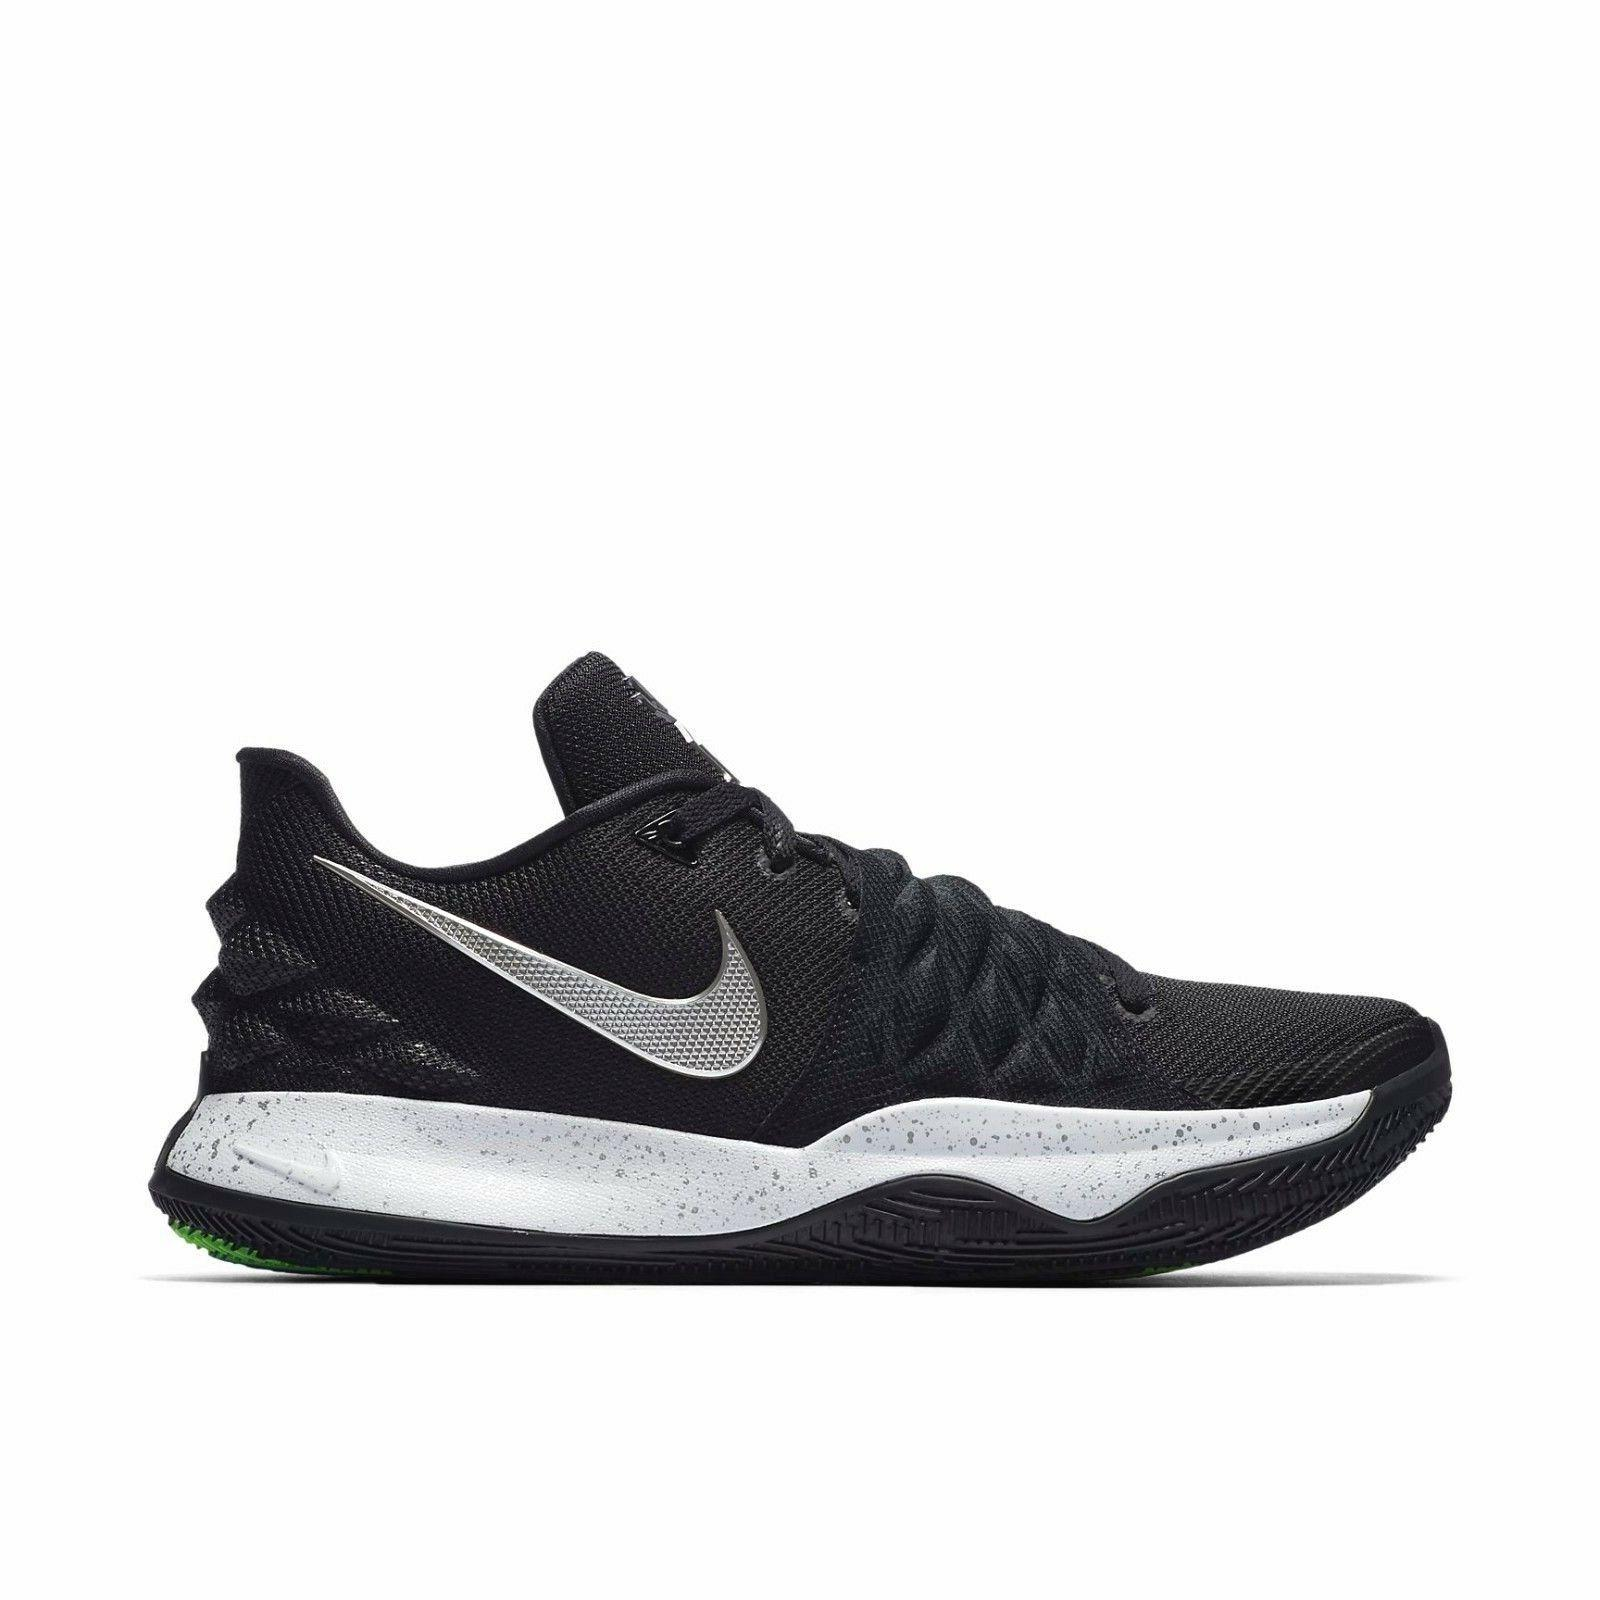 Nike Basketball Shoes 11 Black Metallic